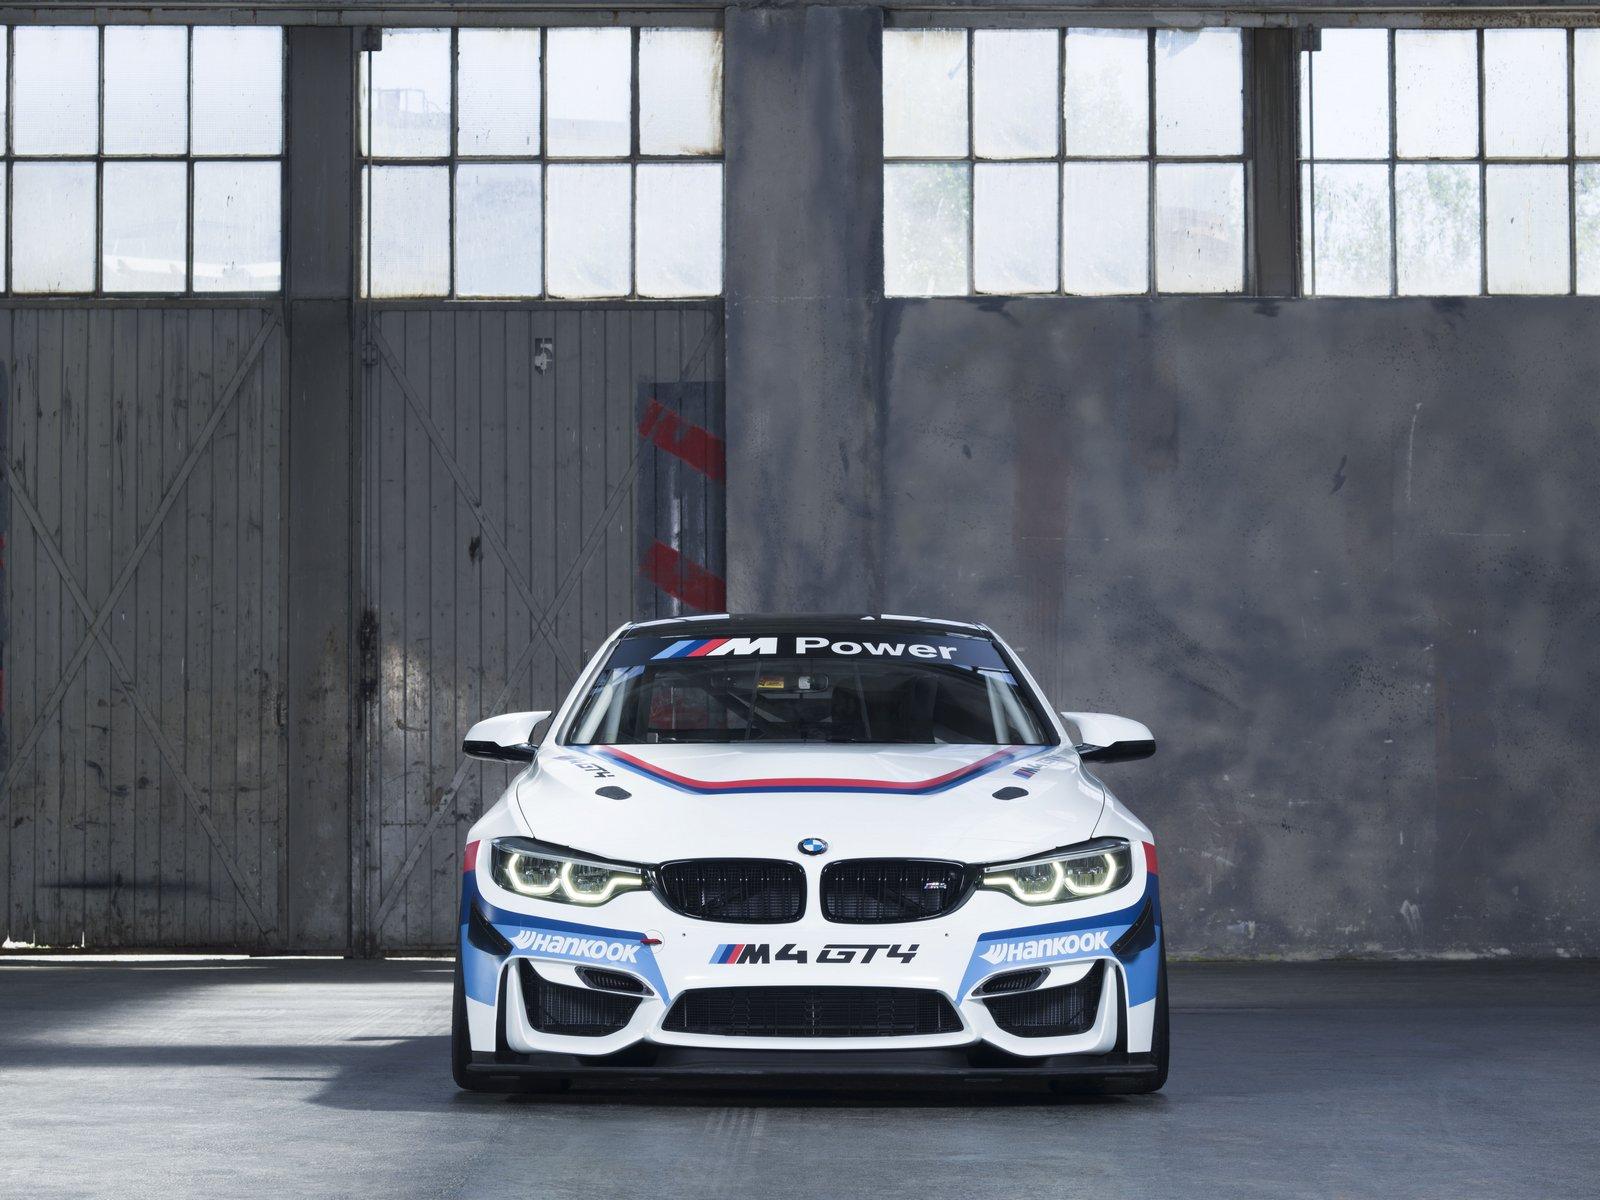 2014 - [BMW] M3 & M4 [F80/F82/F83] - Page 26 BMW-M4-GT4-4